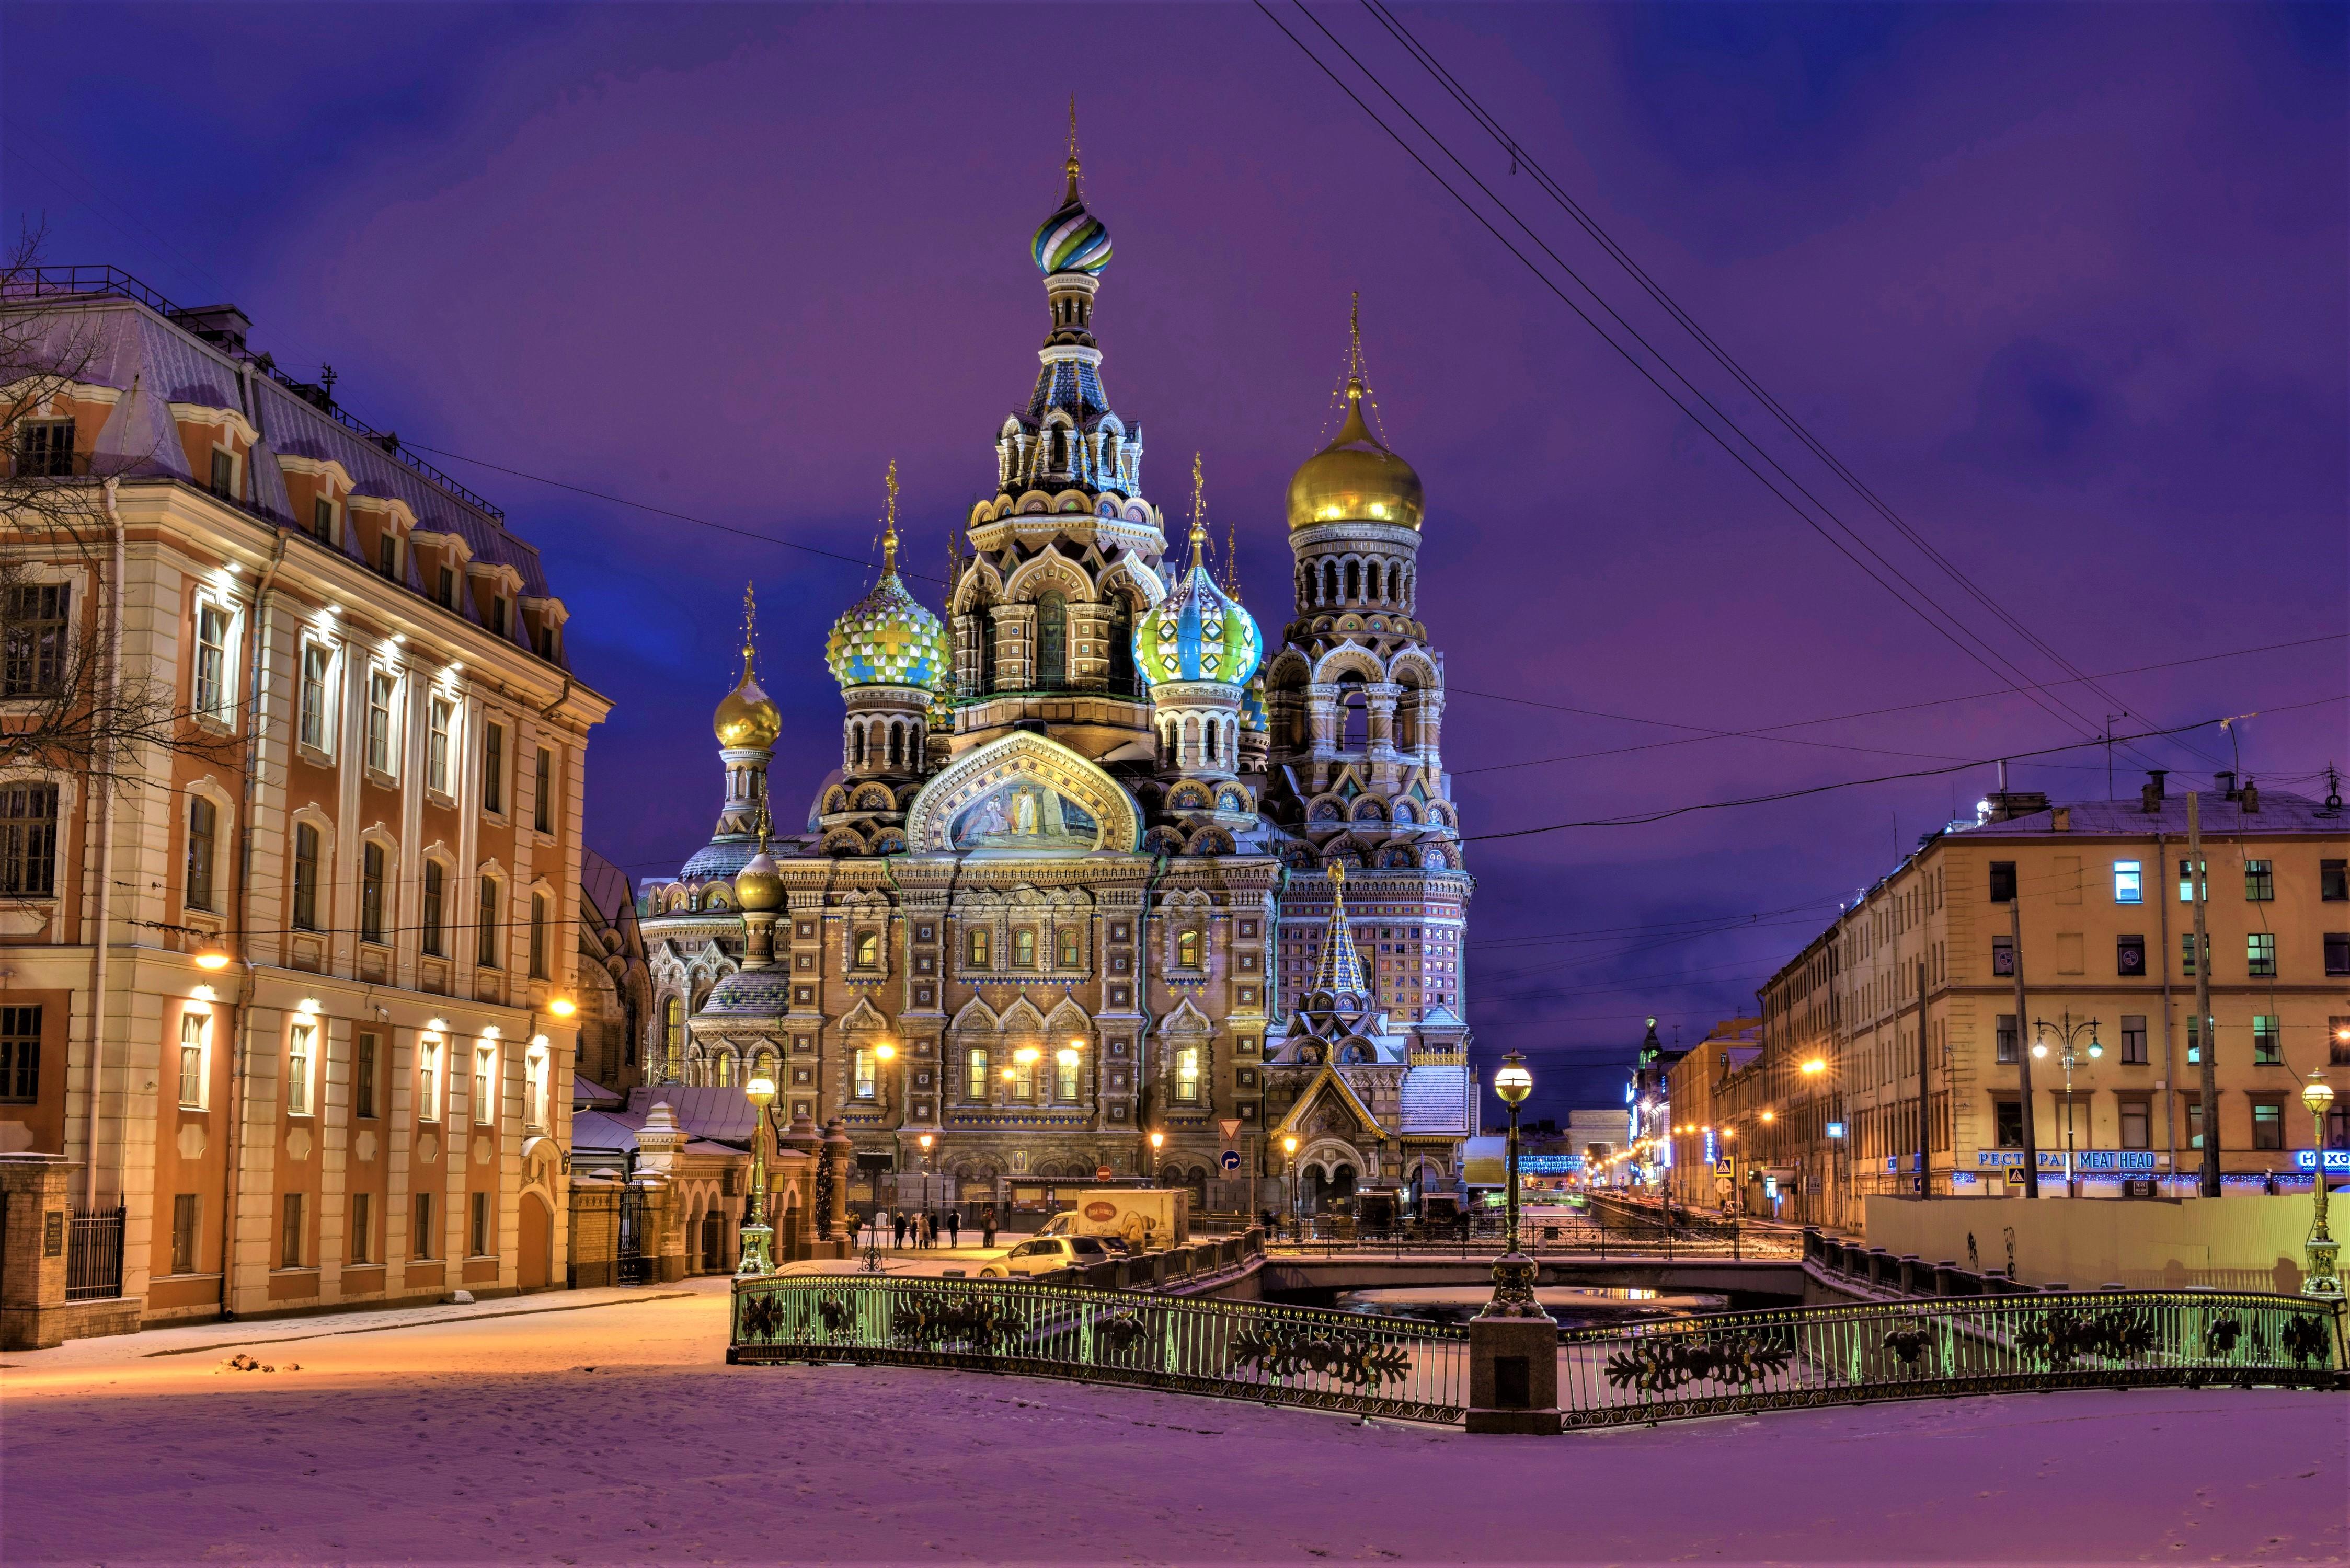 Saint petersburg russia 4k ultra hd wallpaper background image 4495x3000 id 890704 - 4k wallpaper russia ...